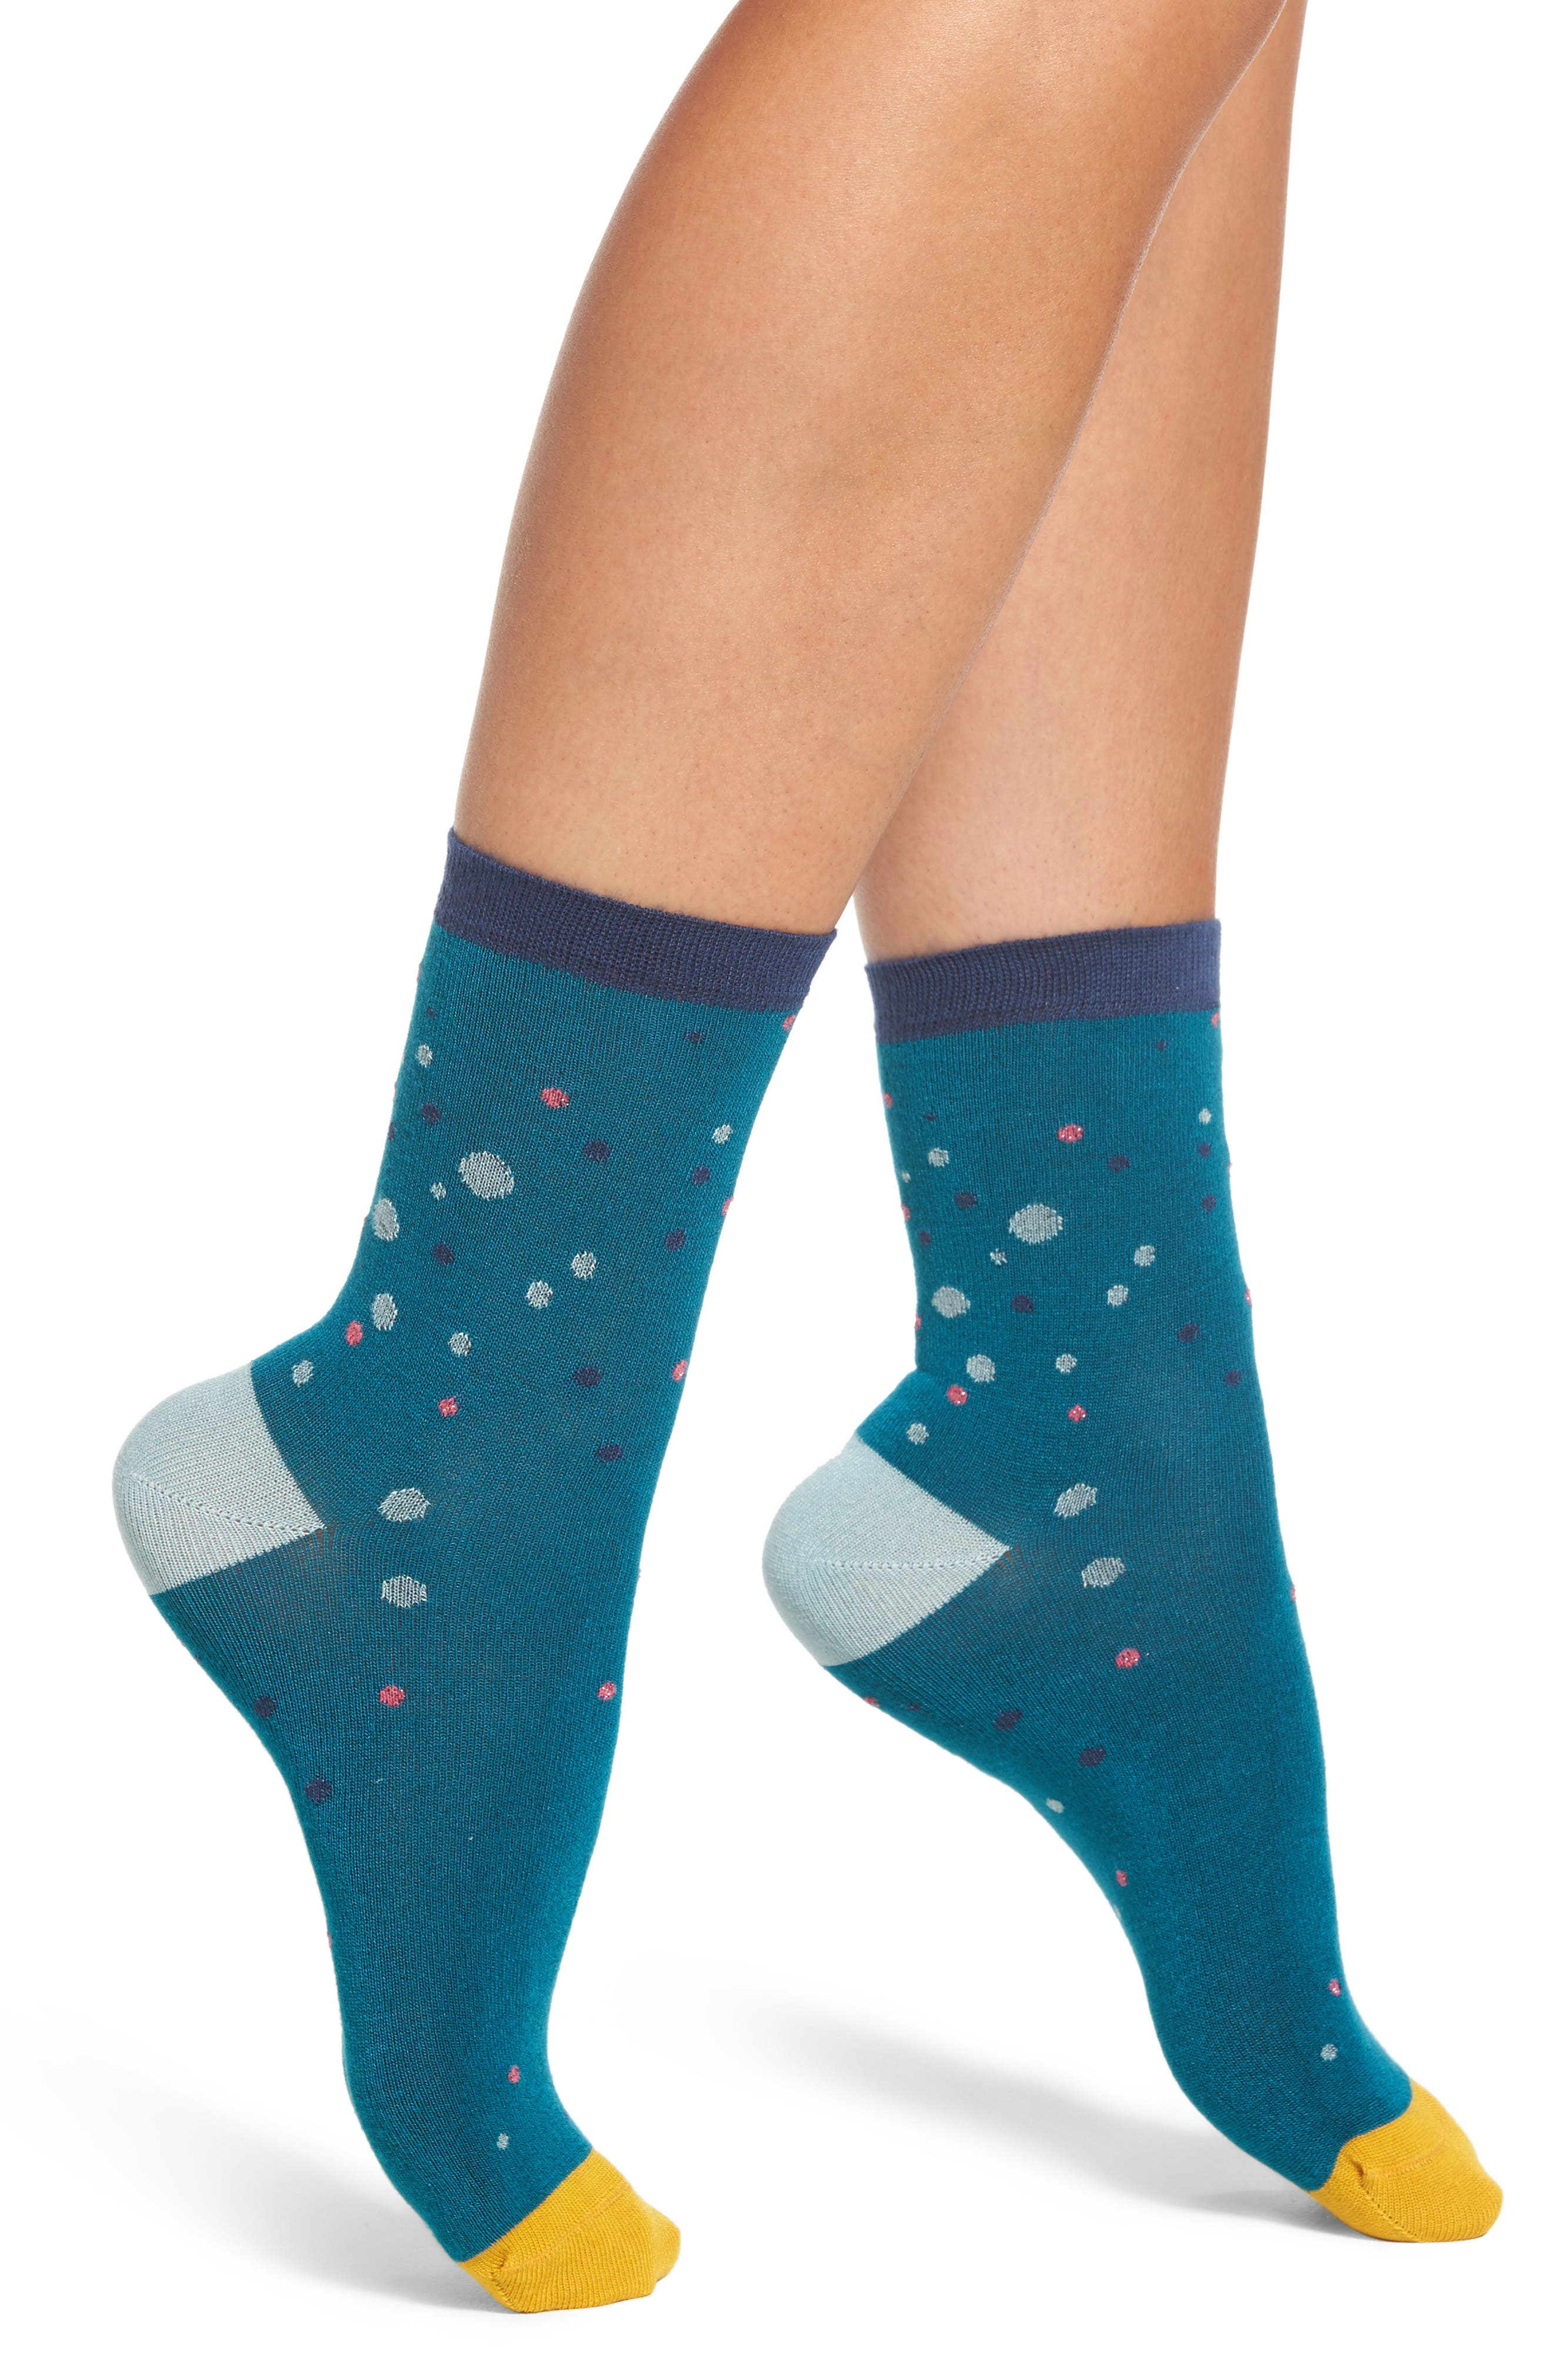 Poppy Socks,                         Main,                         color, Blue